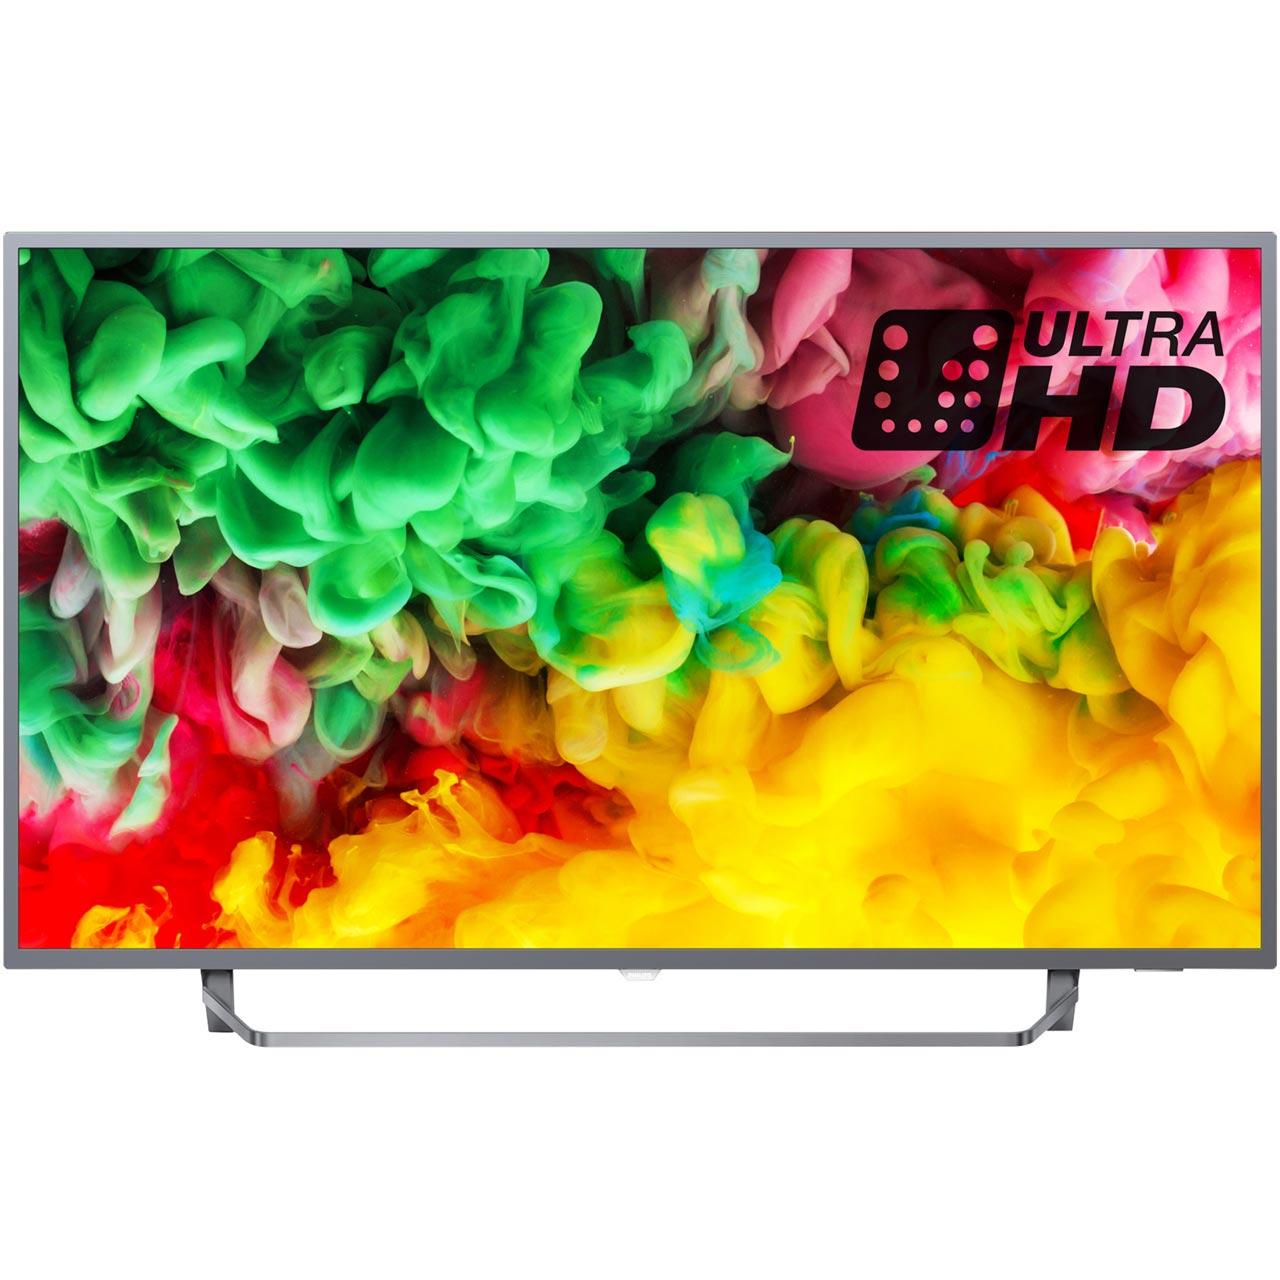 "Philips 55PUS6753 55"" Smart Ambilight 4K Ultra HD TV £386.10 @ AO"